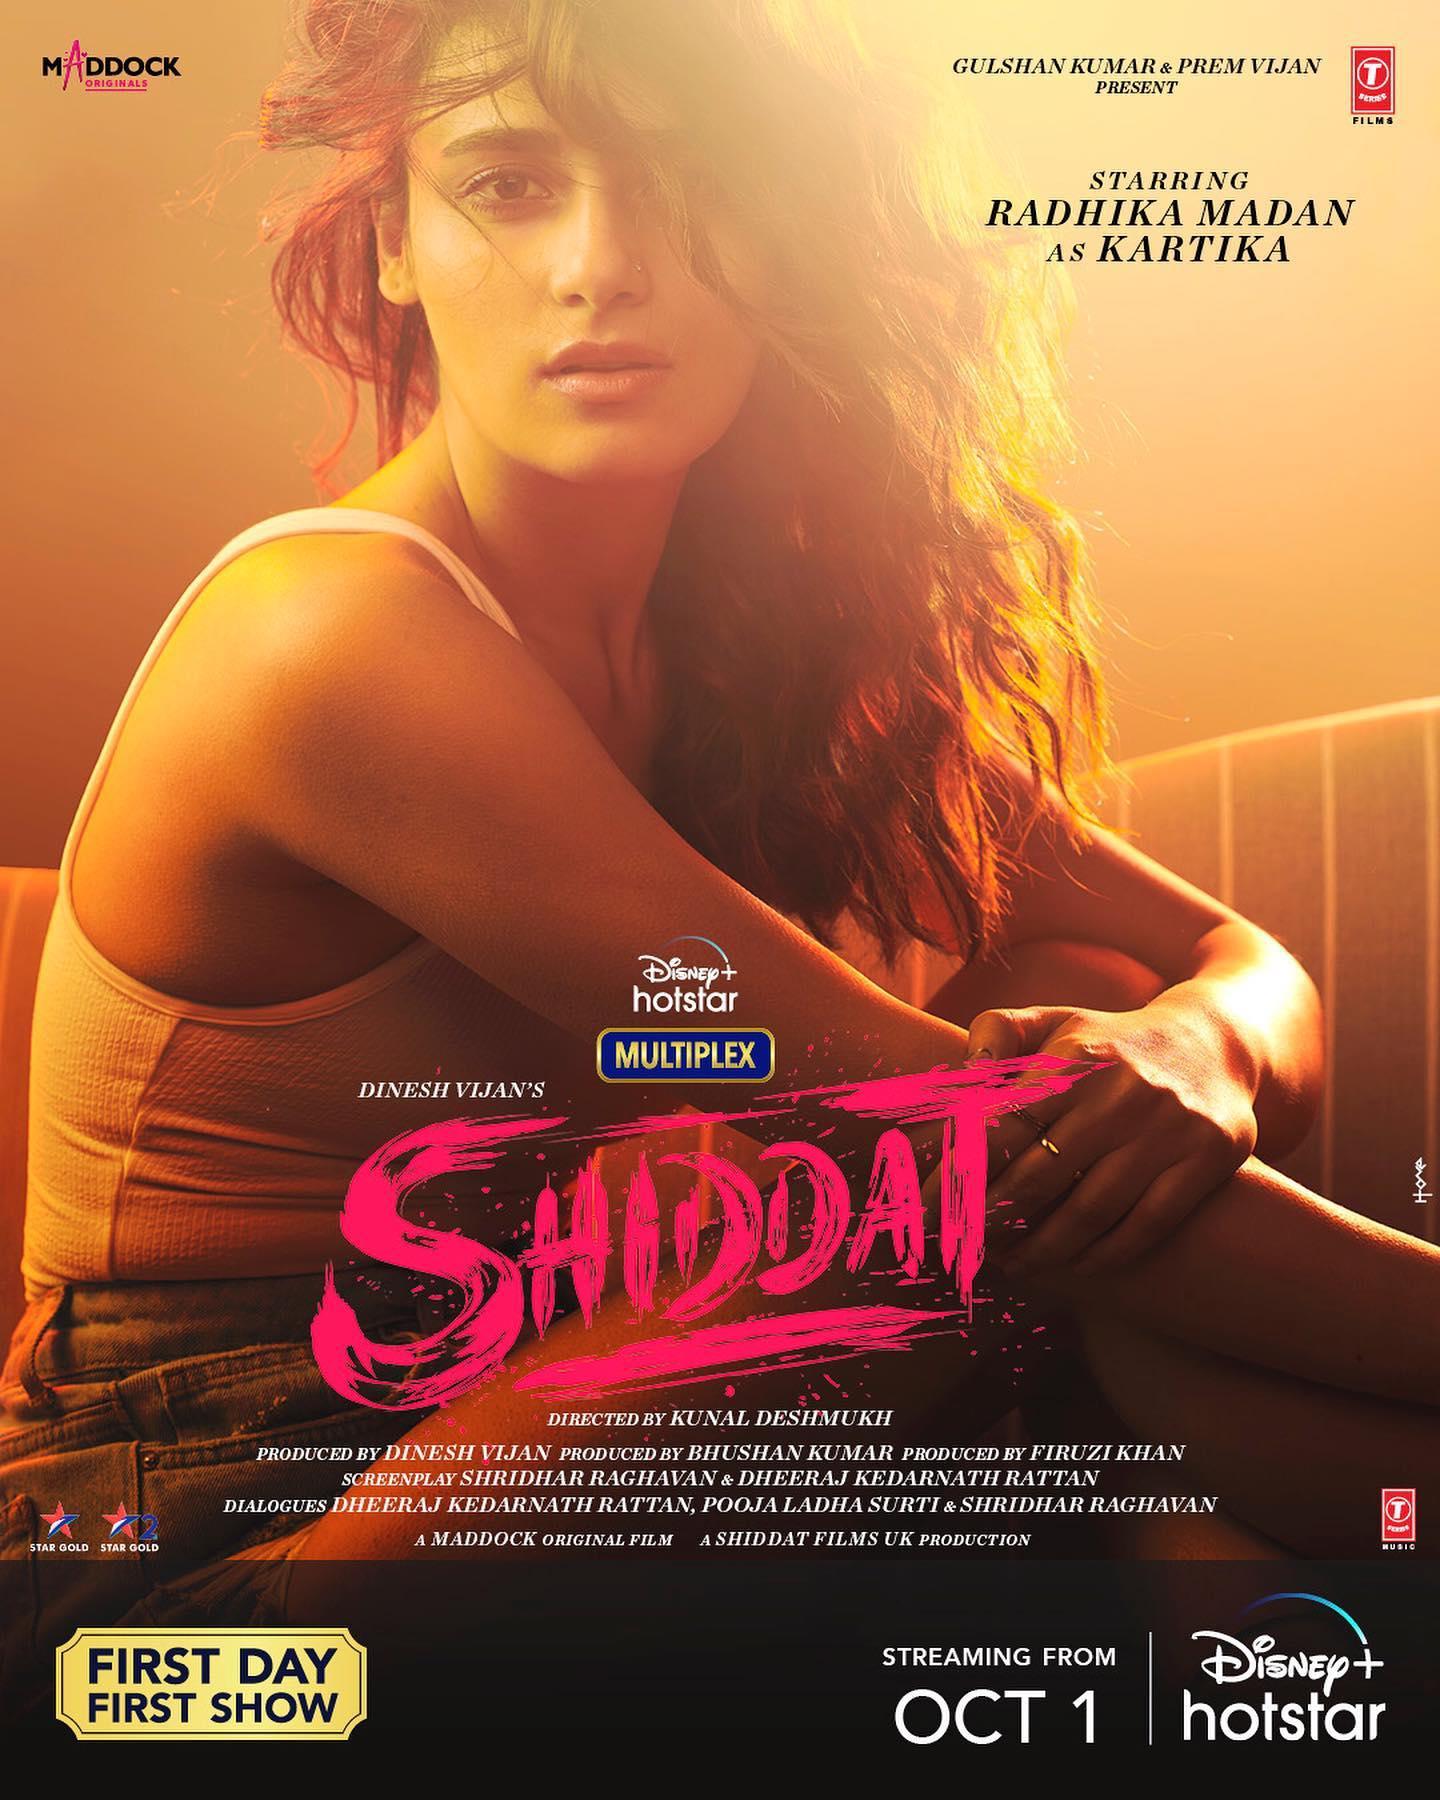 Radhika Madan dalam Poster Film Shiddat